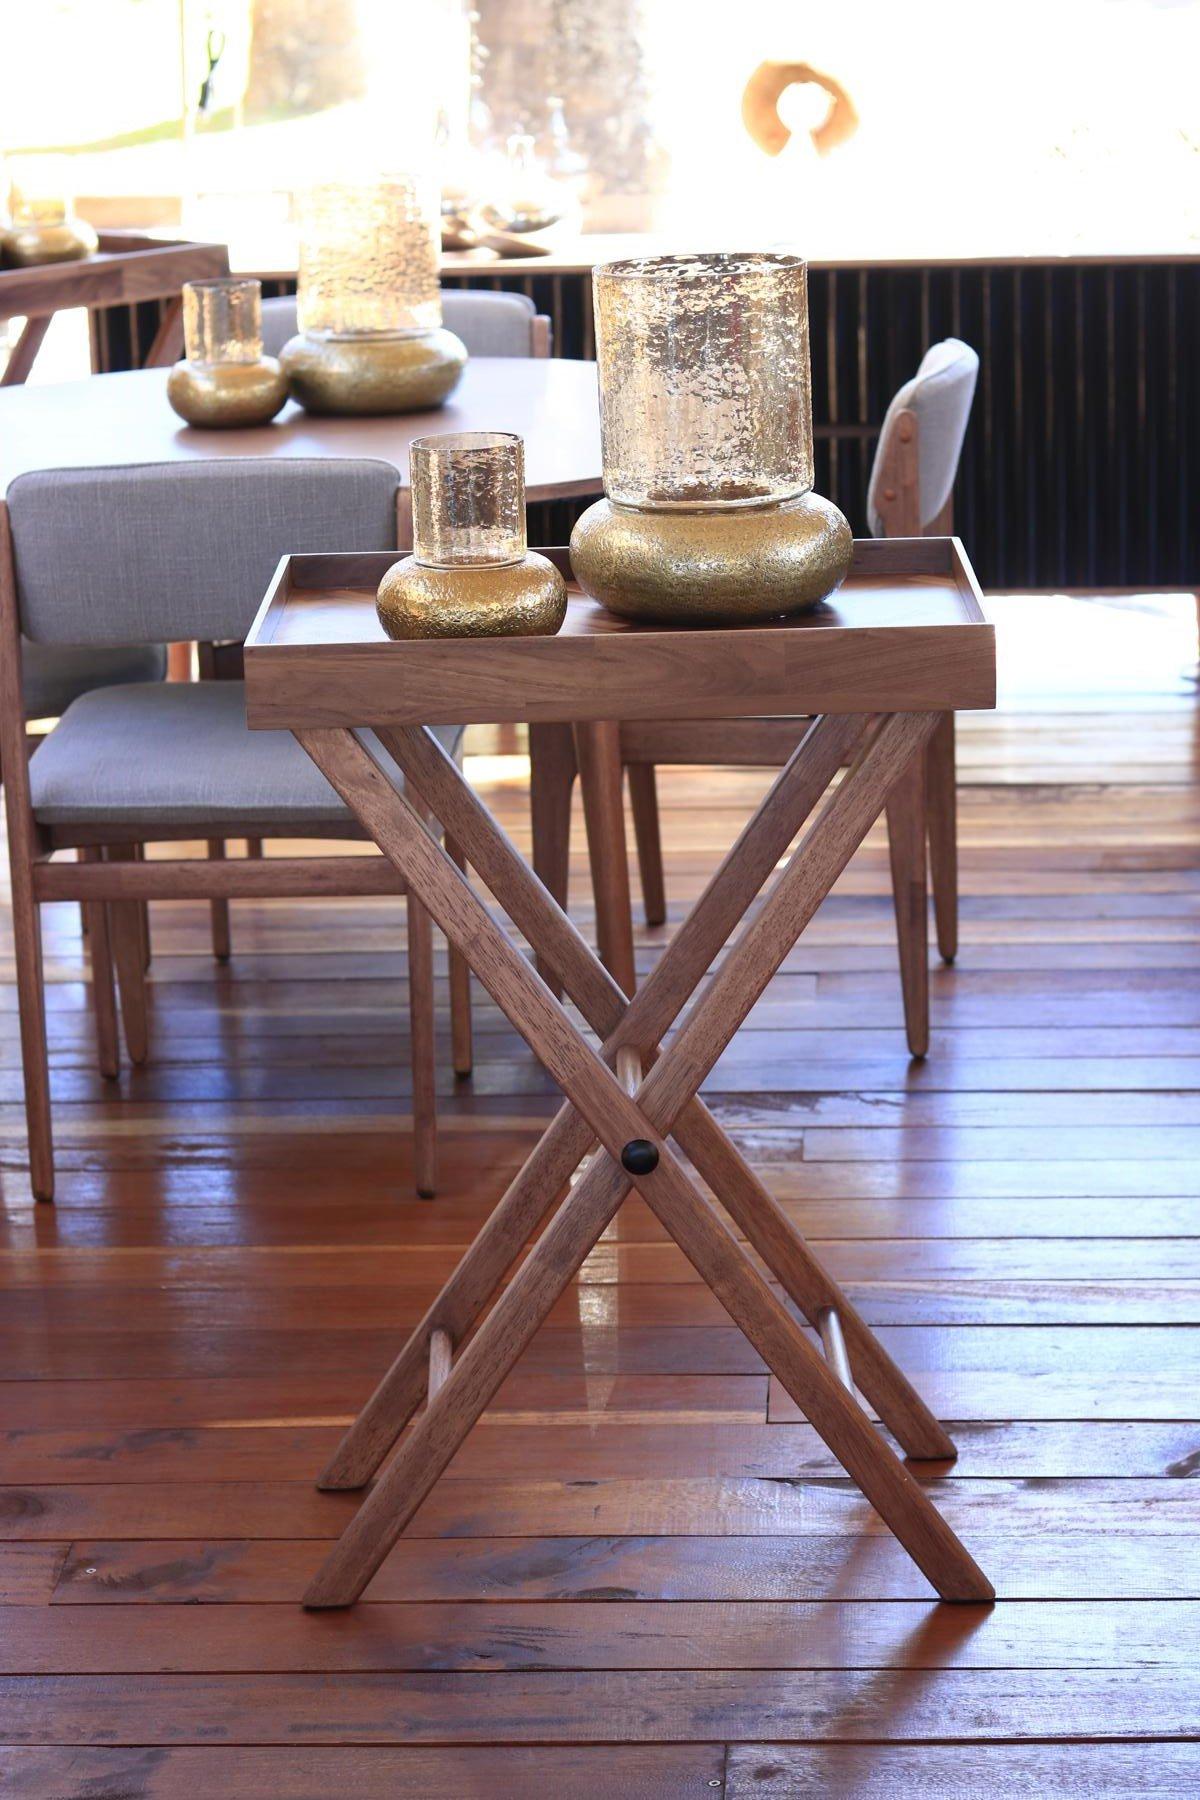 Harmonize high tray table